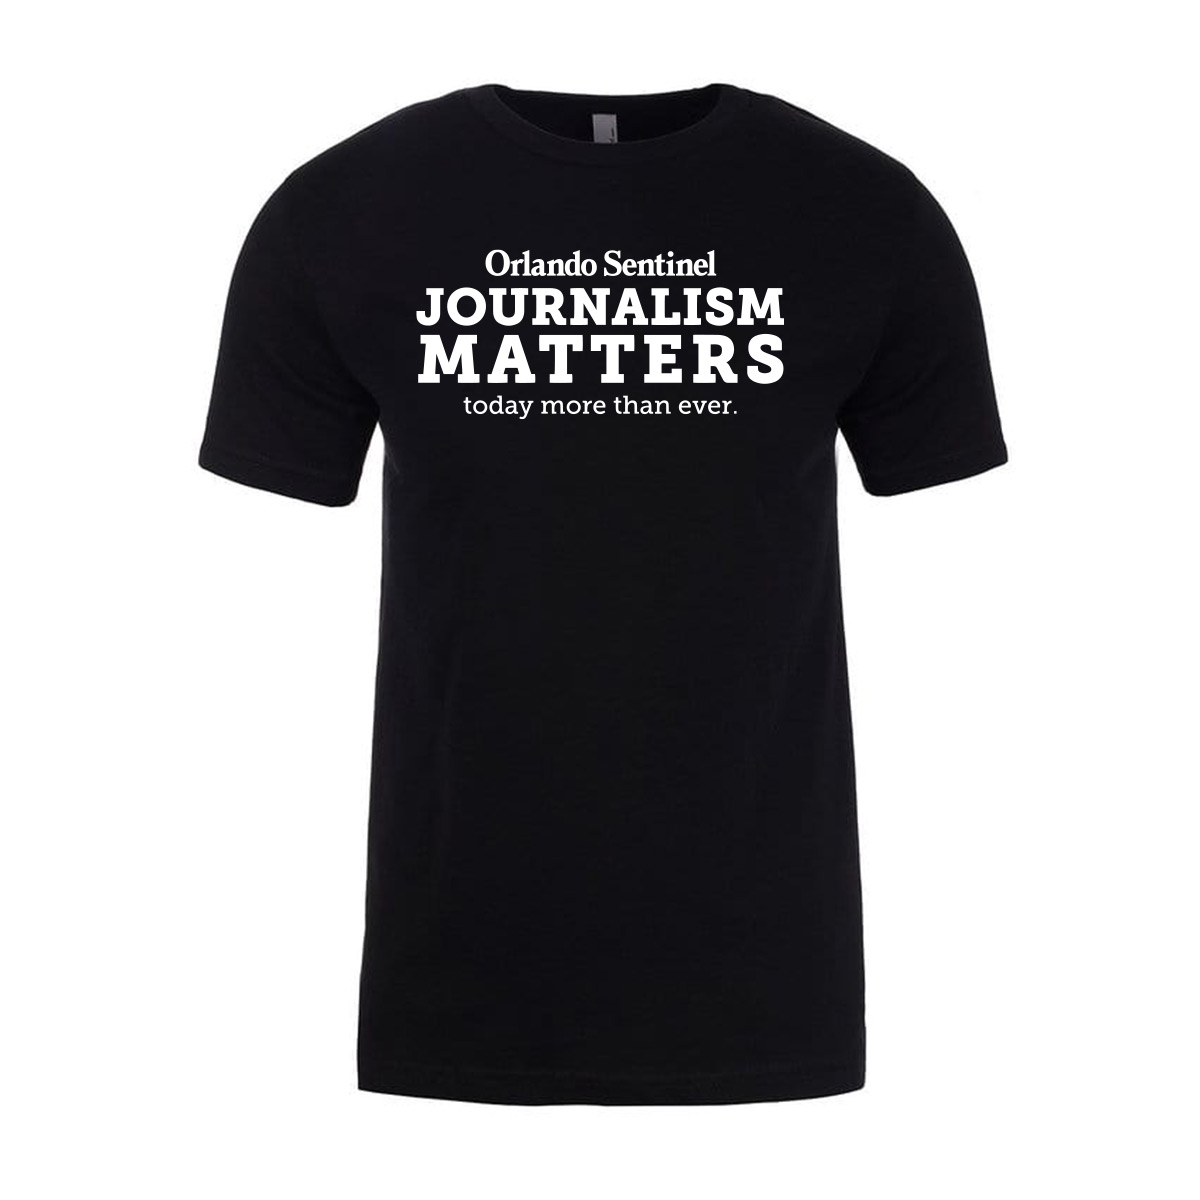 Orlando Sentinel Journalism Matters Shirt